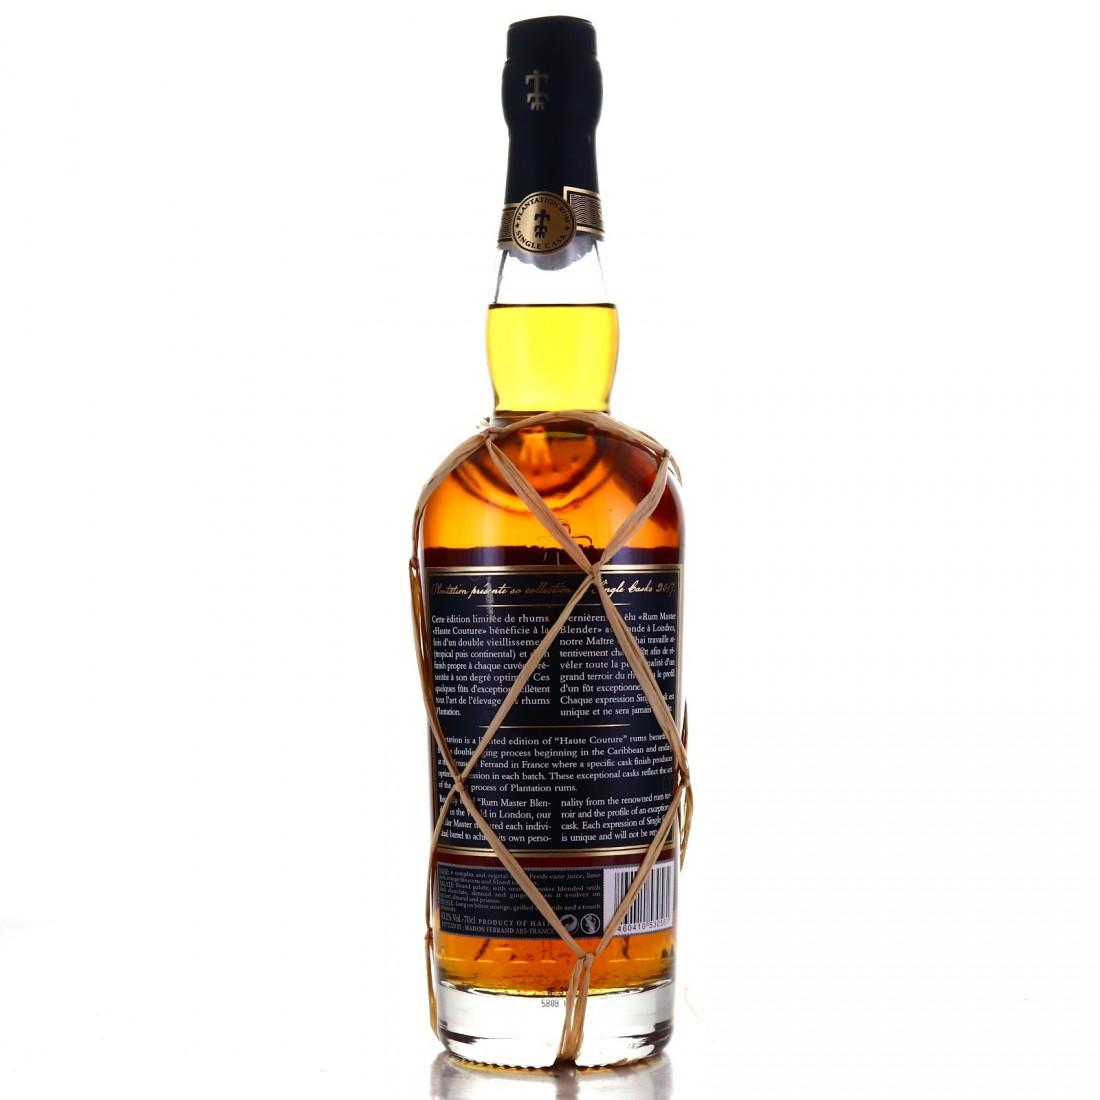 Haiti Rum XO Plantation Single Dry Curacao Cask Finish #6